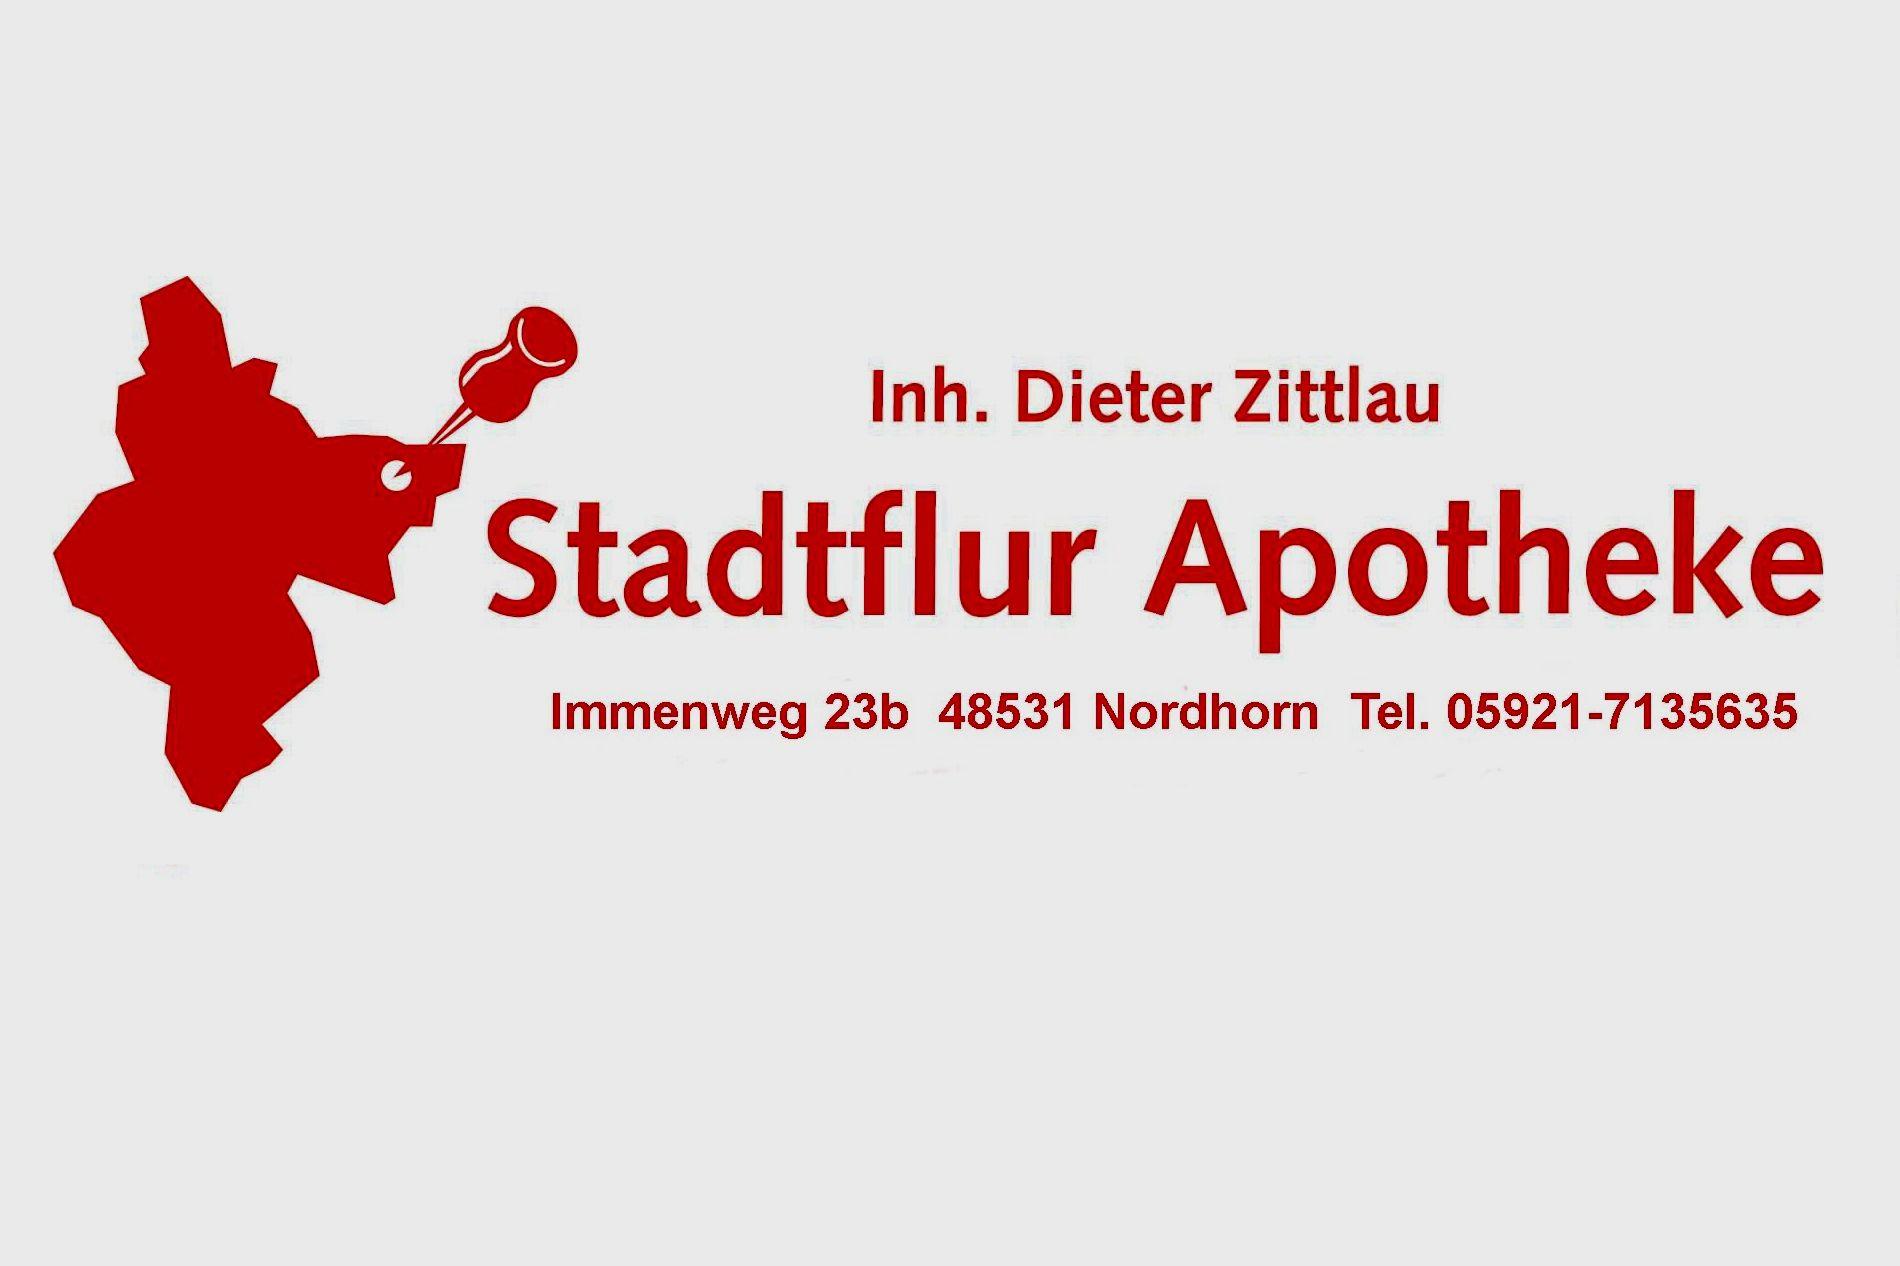 Stadtflur Apotheke